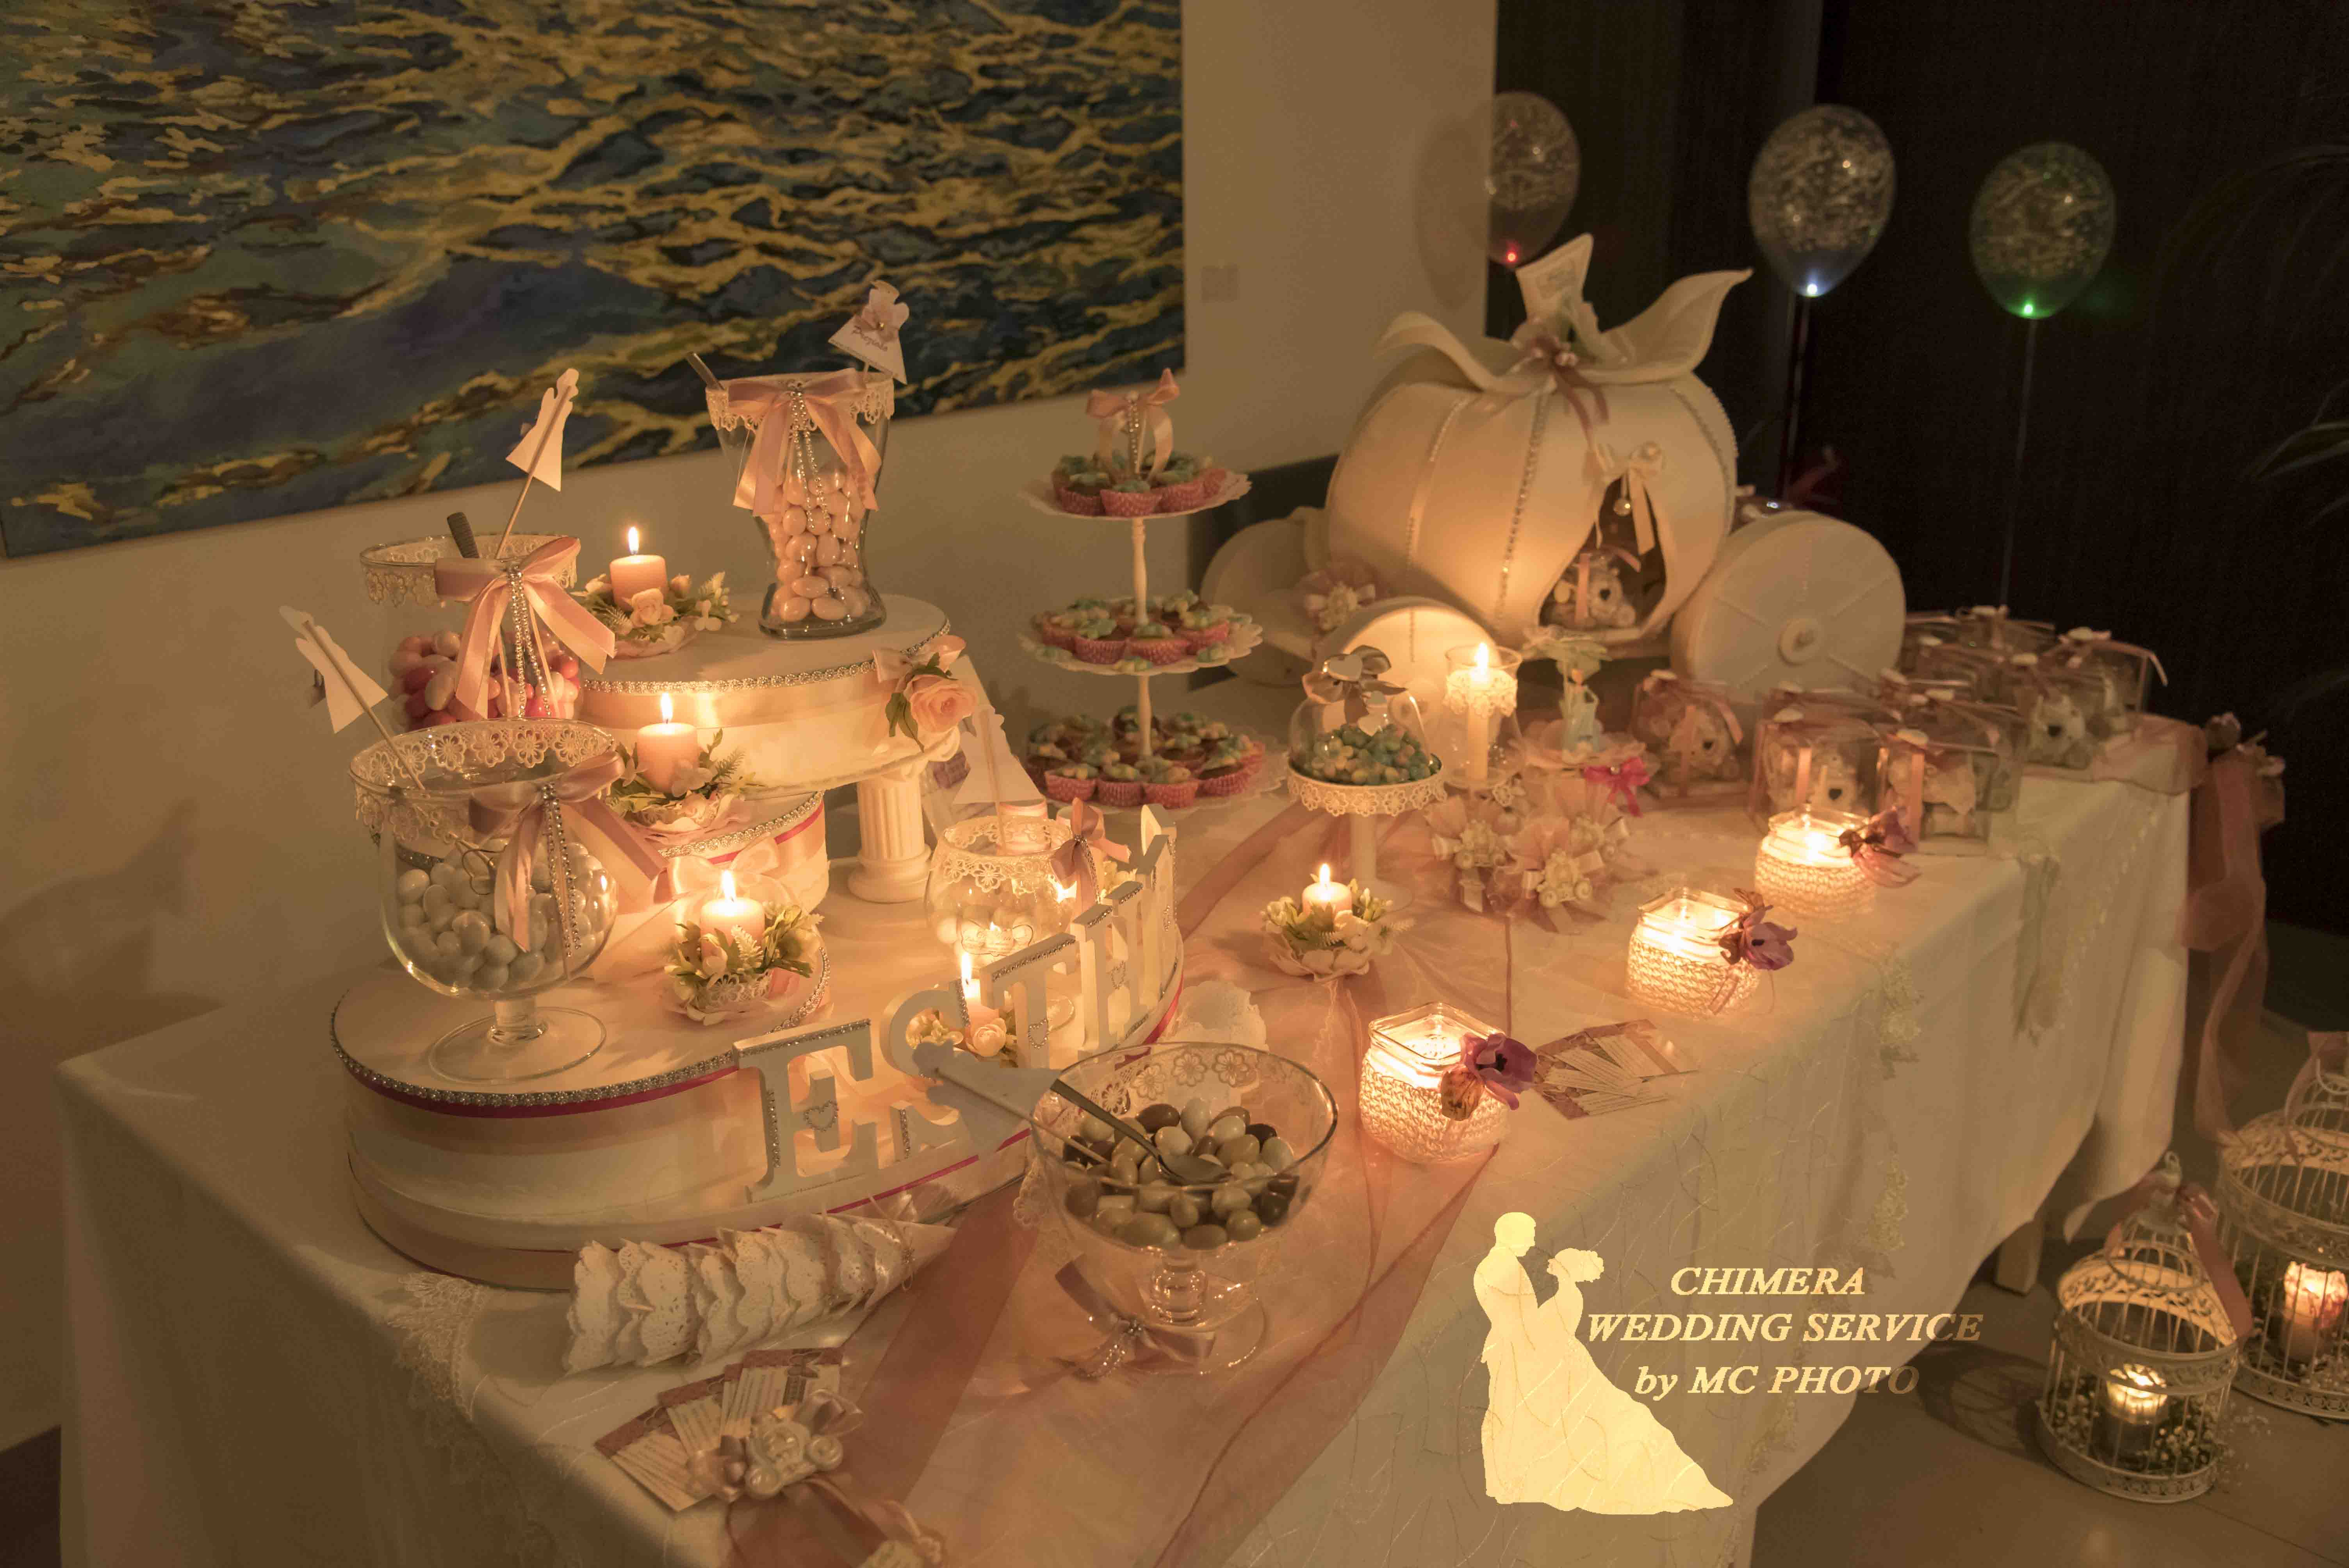 Bomboniere Matrimonio Wedding Planner.Bomboniere Per Matrimonio Comunione Battesimo Cresima Laurea